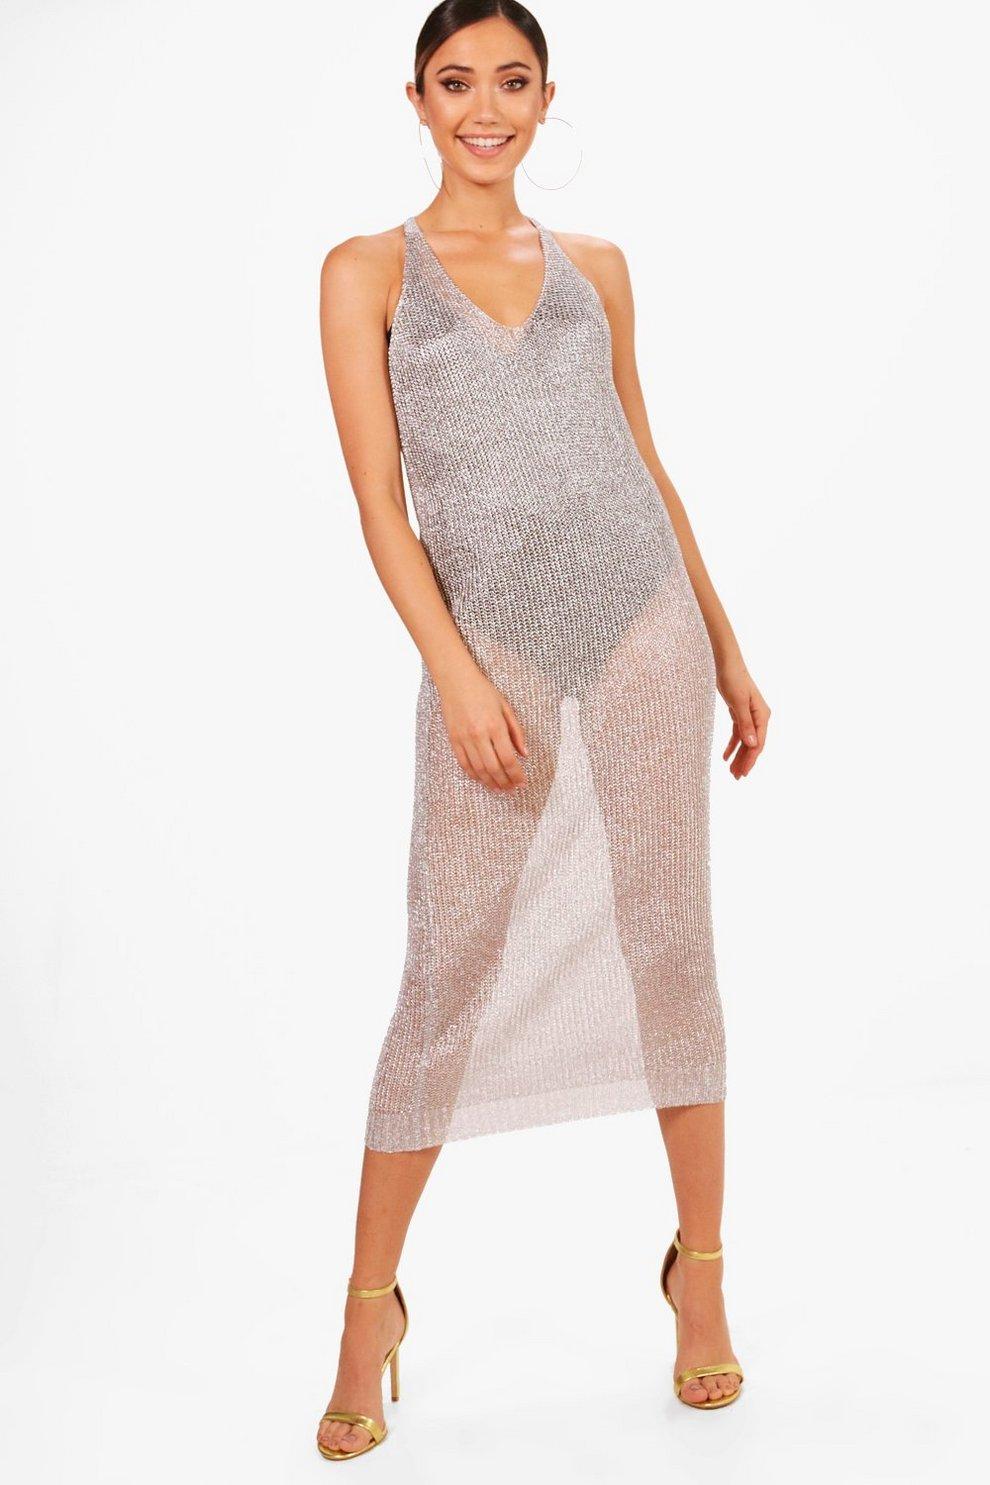 Boohoo Strap Detail Metallic Knit Maxi Dress Cheap Countdown Package Cheap Sale Latest Collections chBYk4kN1q